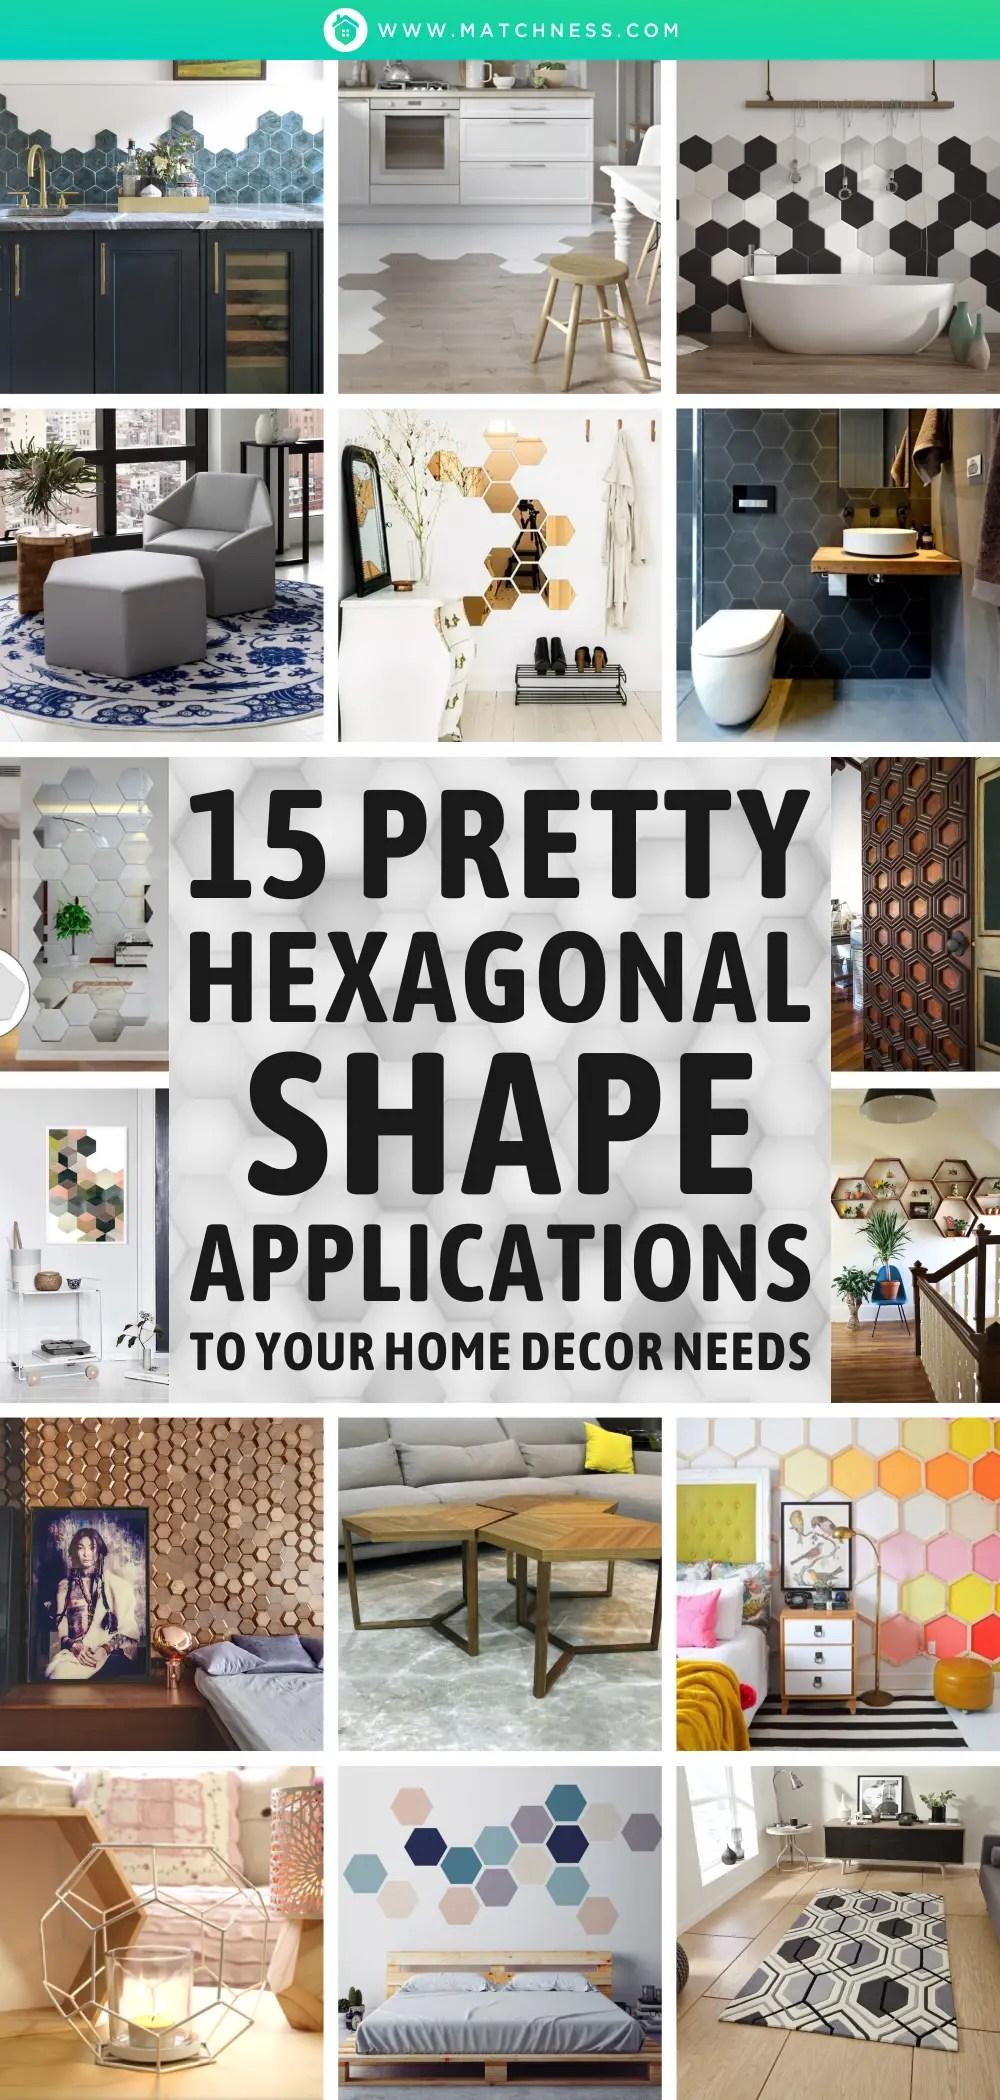 15-pretty-hexagonal-shape-applications-to-your-home-decor-needs1-copy